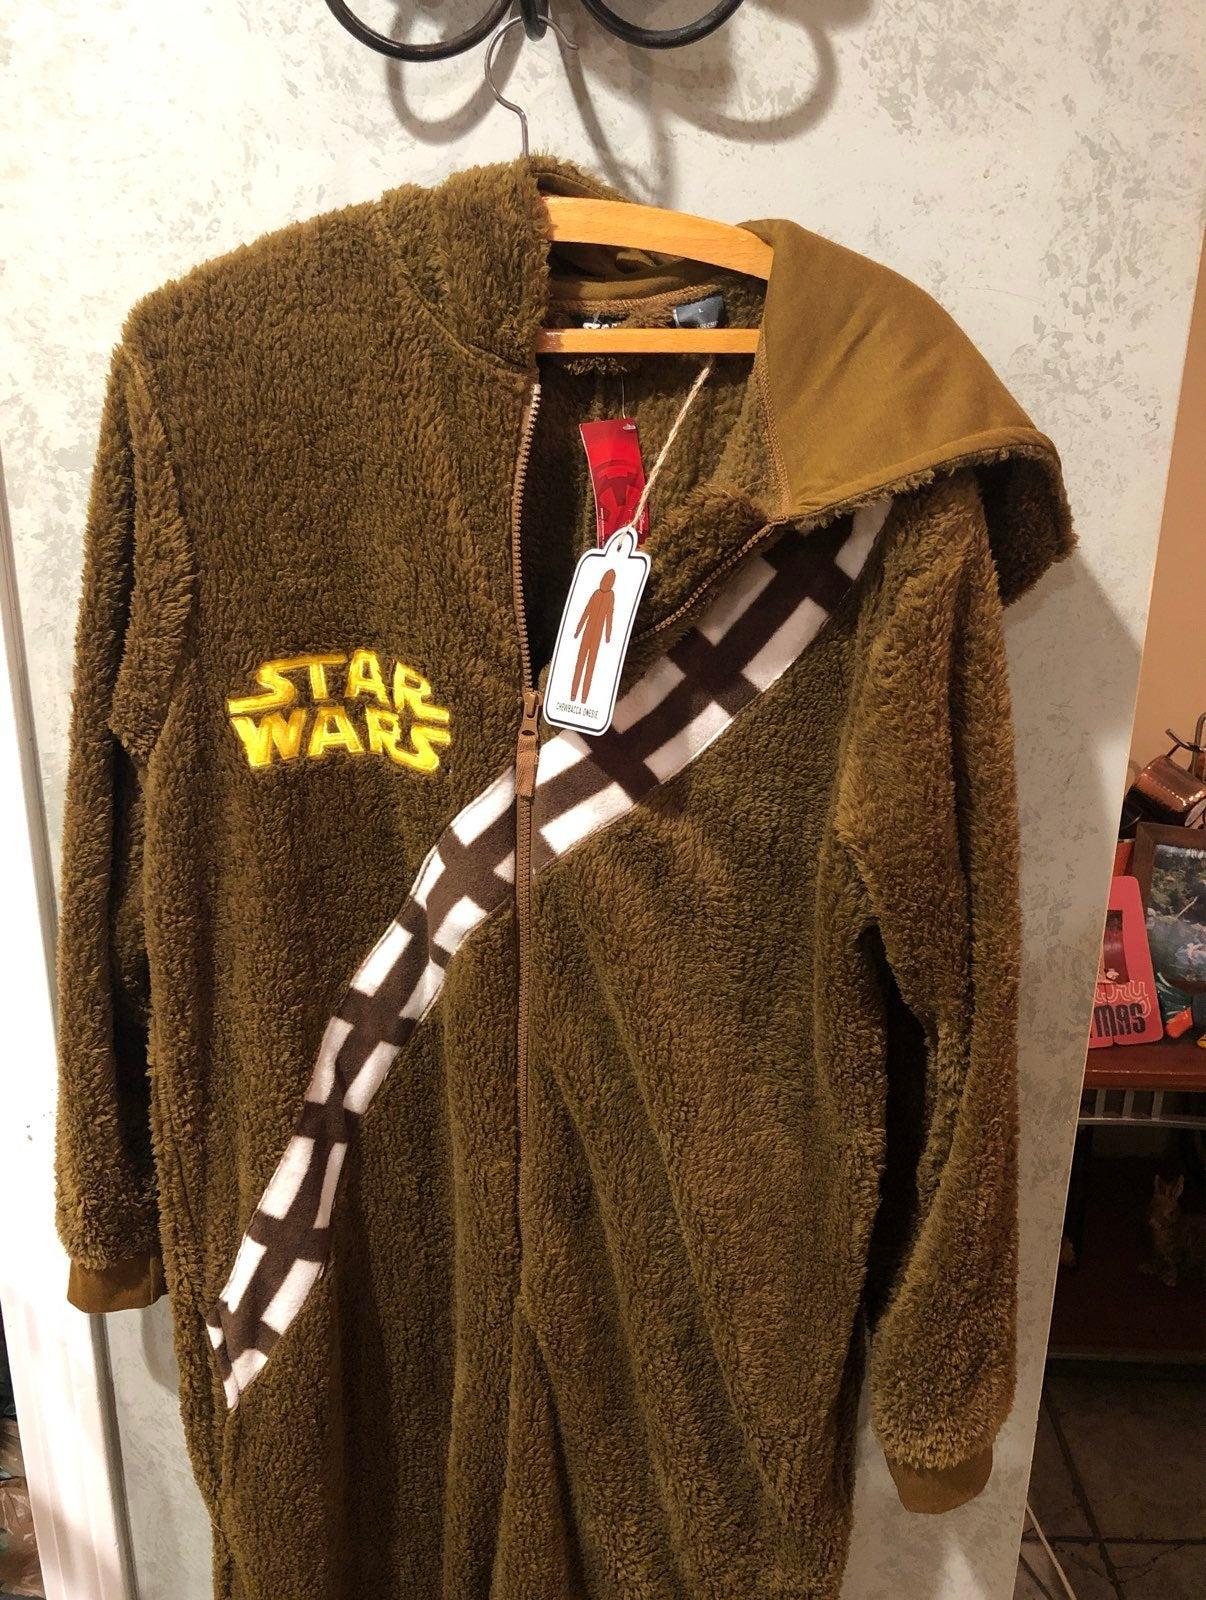 Star Wars chewbacca adult large fleece l